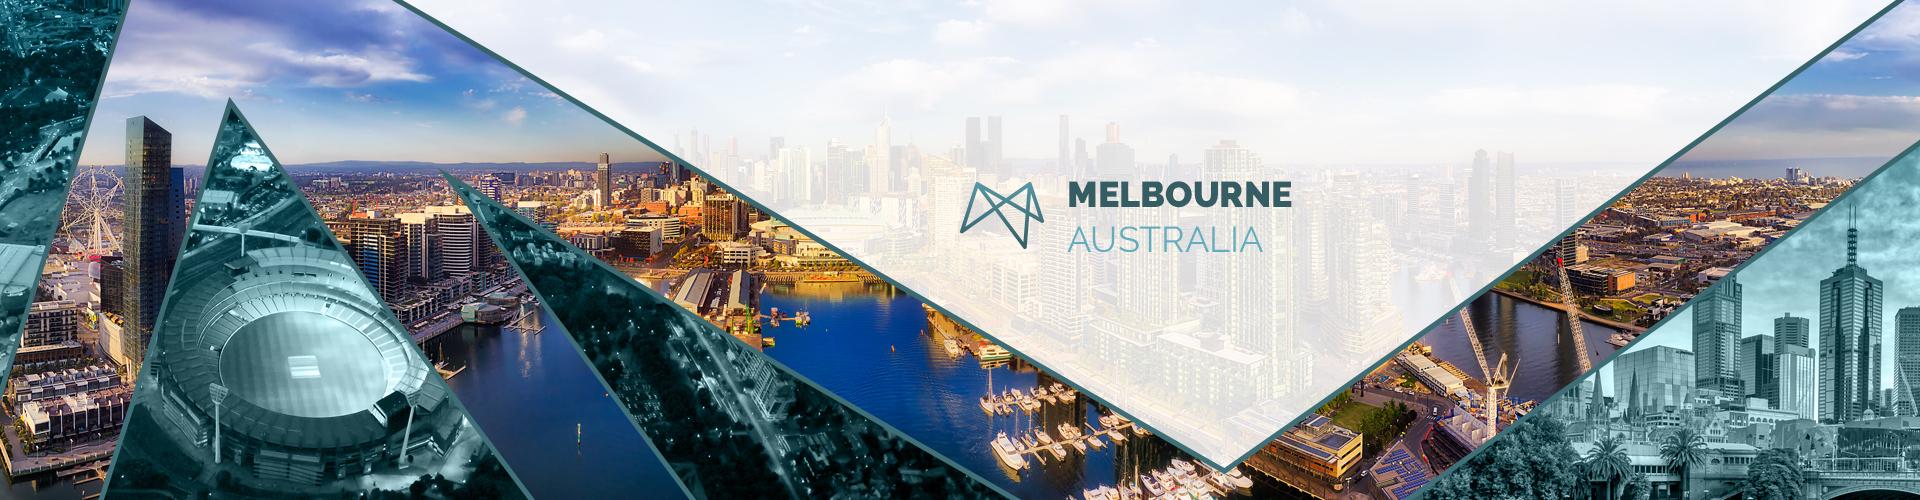 Marsden Group Banner Contact Melbourne banner